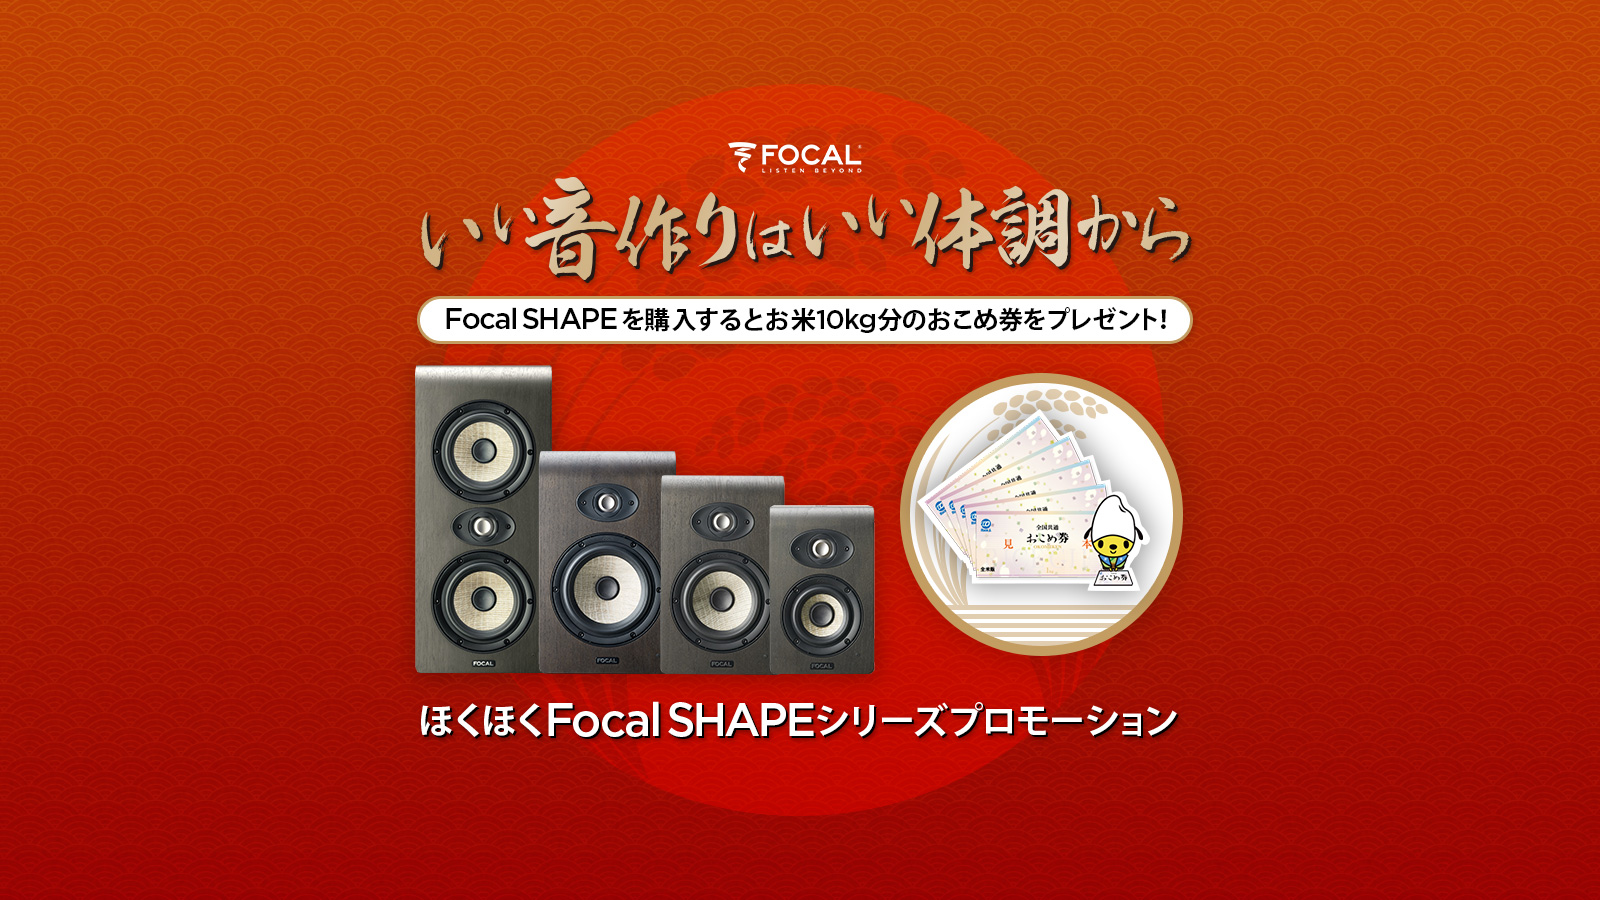 FOCAL PROFESSIONAL SHAPE TWIN(ペア)【ペア購入対象:10kg分のおこめ券プレゼント】